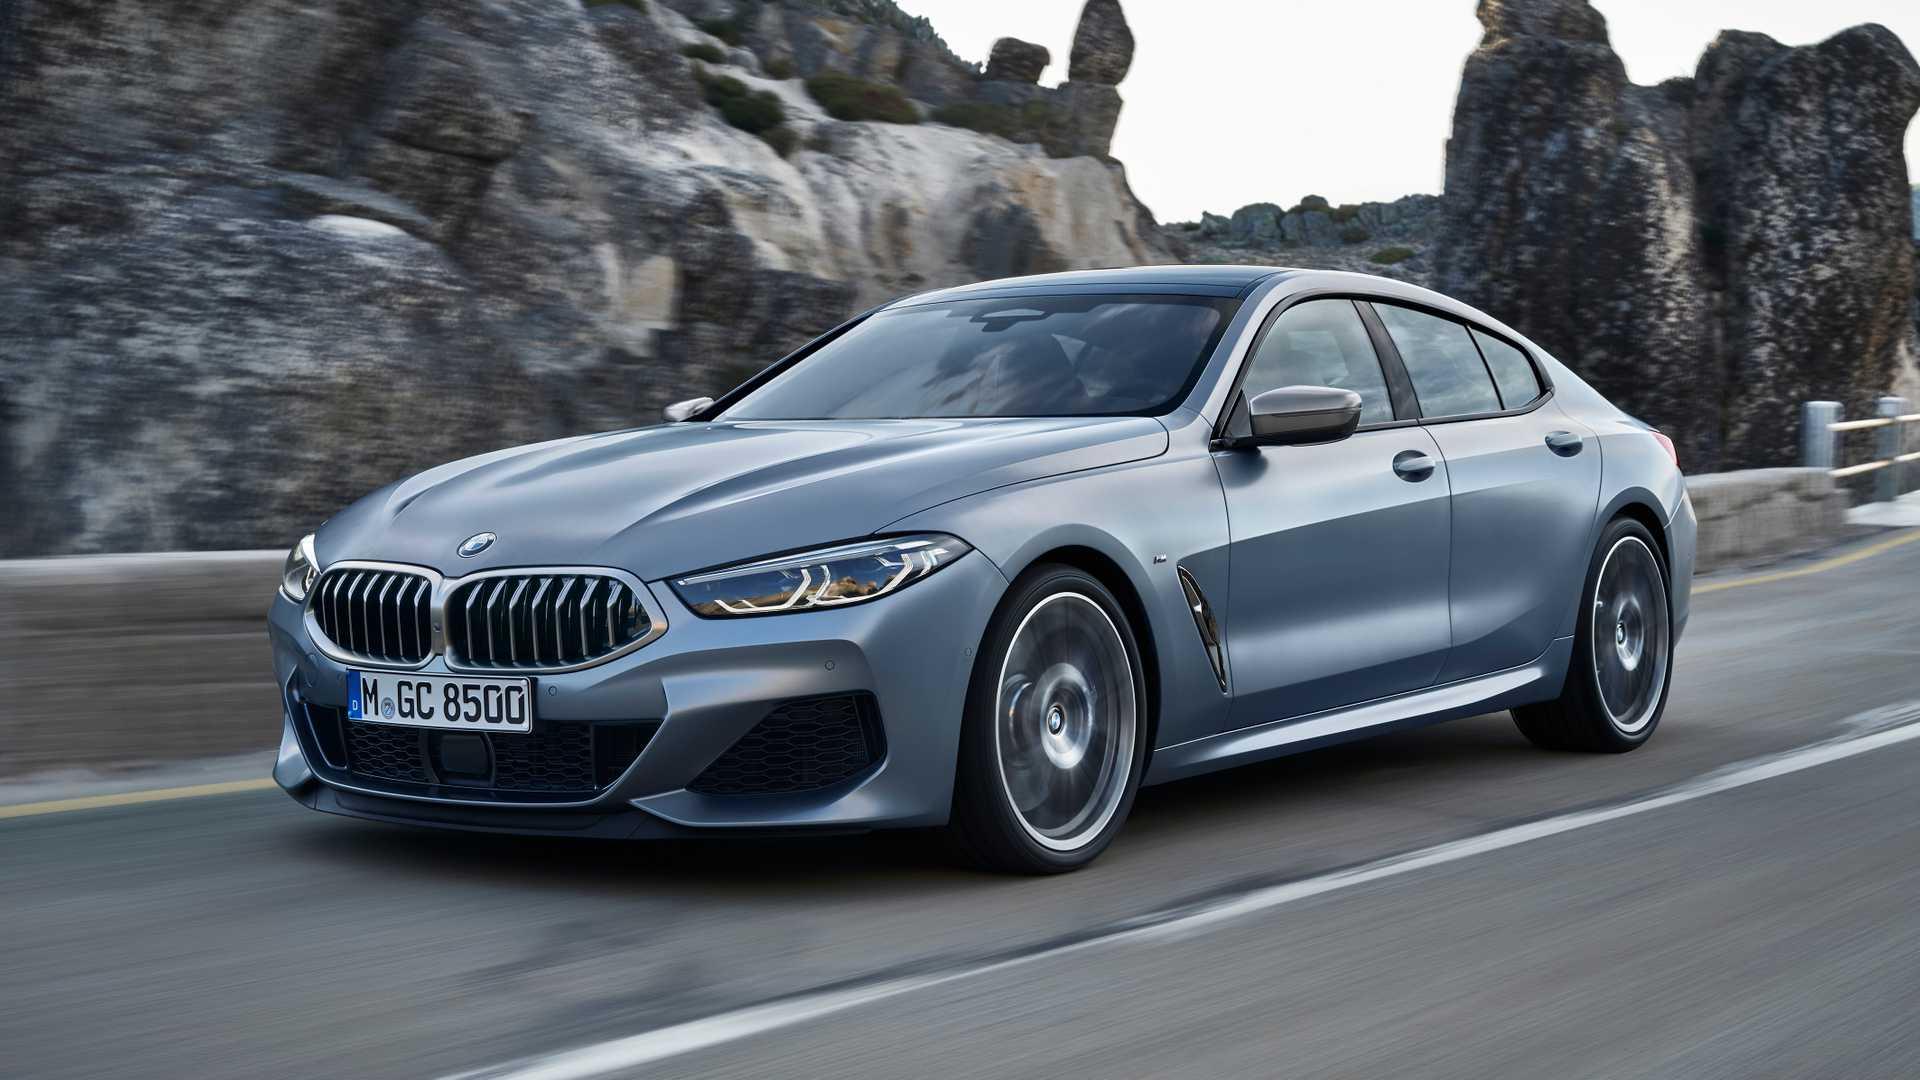 bmw-serie-8-gran-coupe-2020 (5)